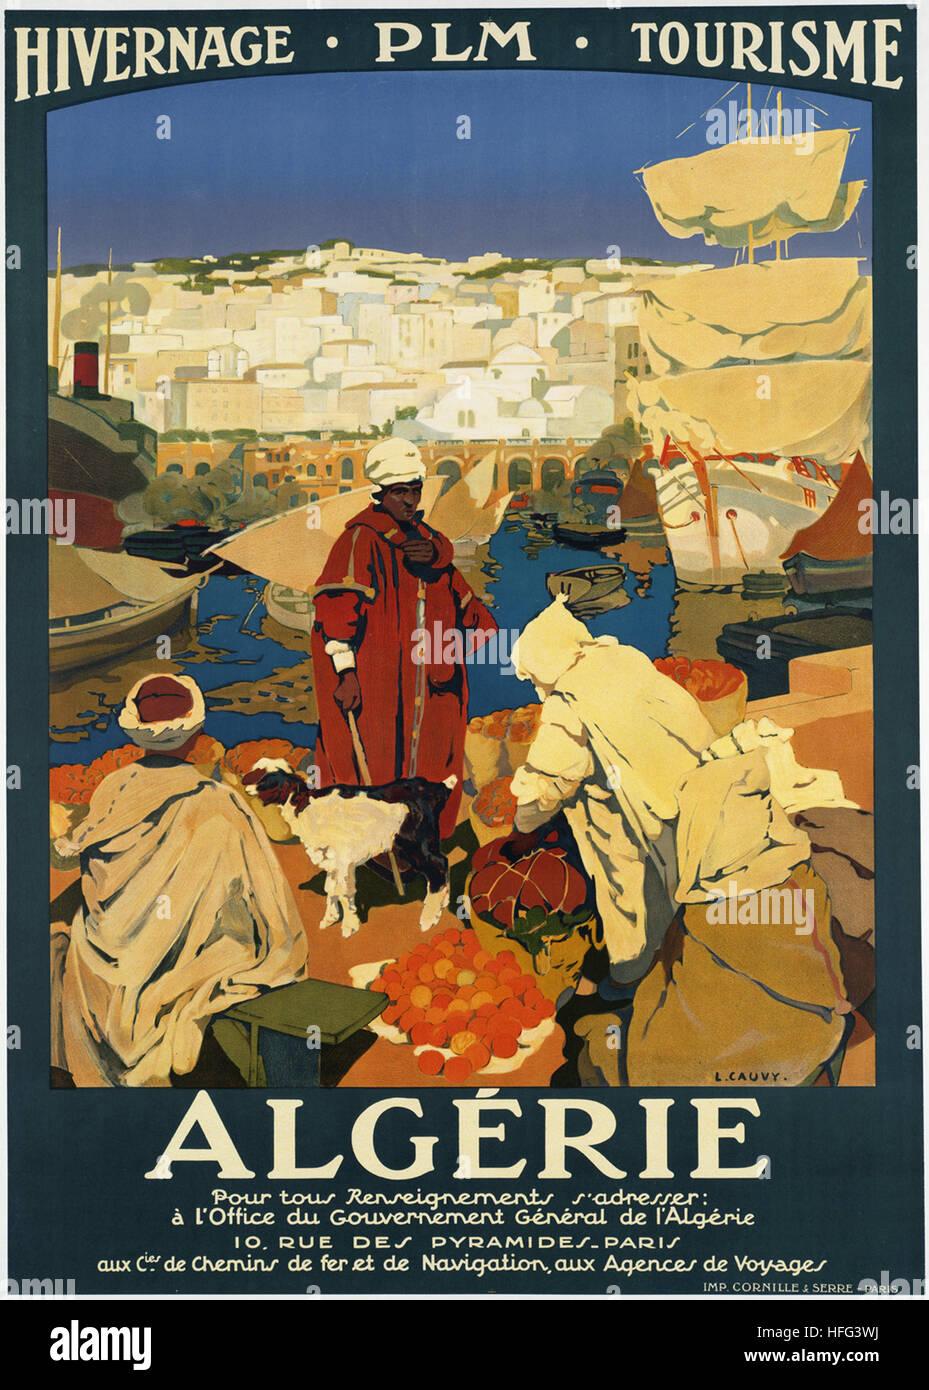 Vintage Travel Poster - Algerie - Stock Image